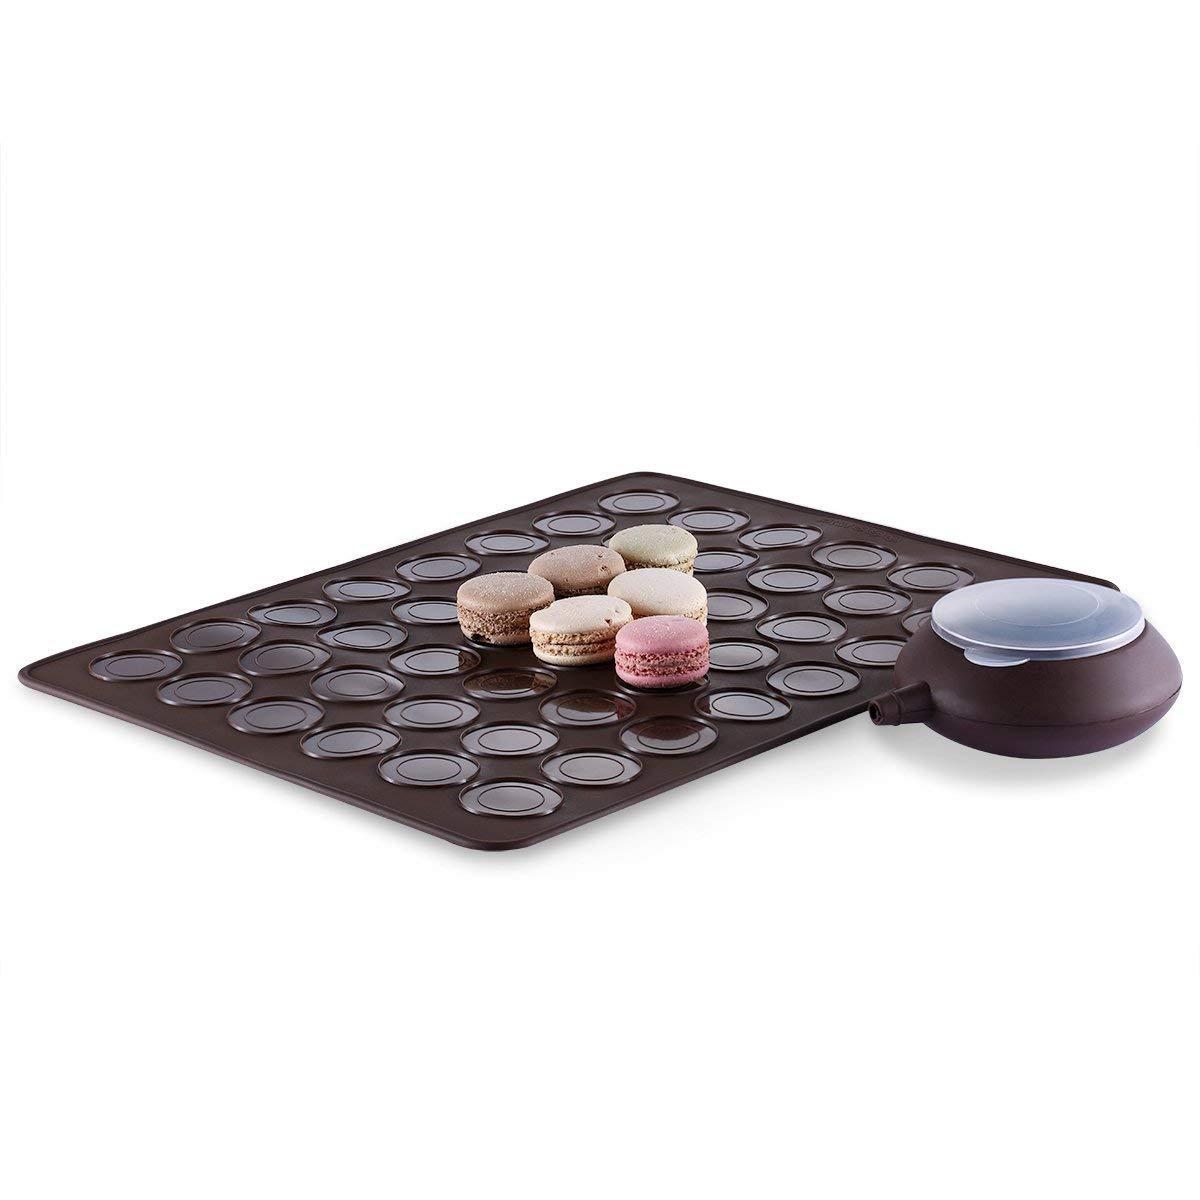 Silikon-Backmatte großes doppeltes mit Seiten versehenes Macaron Makronen Kits